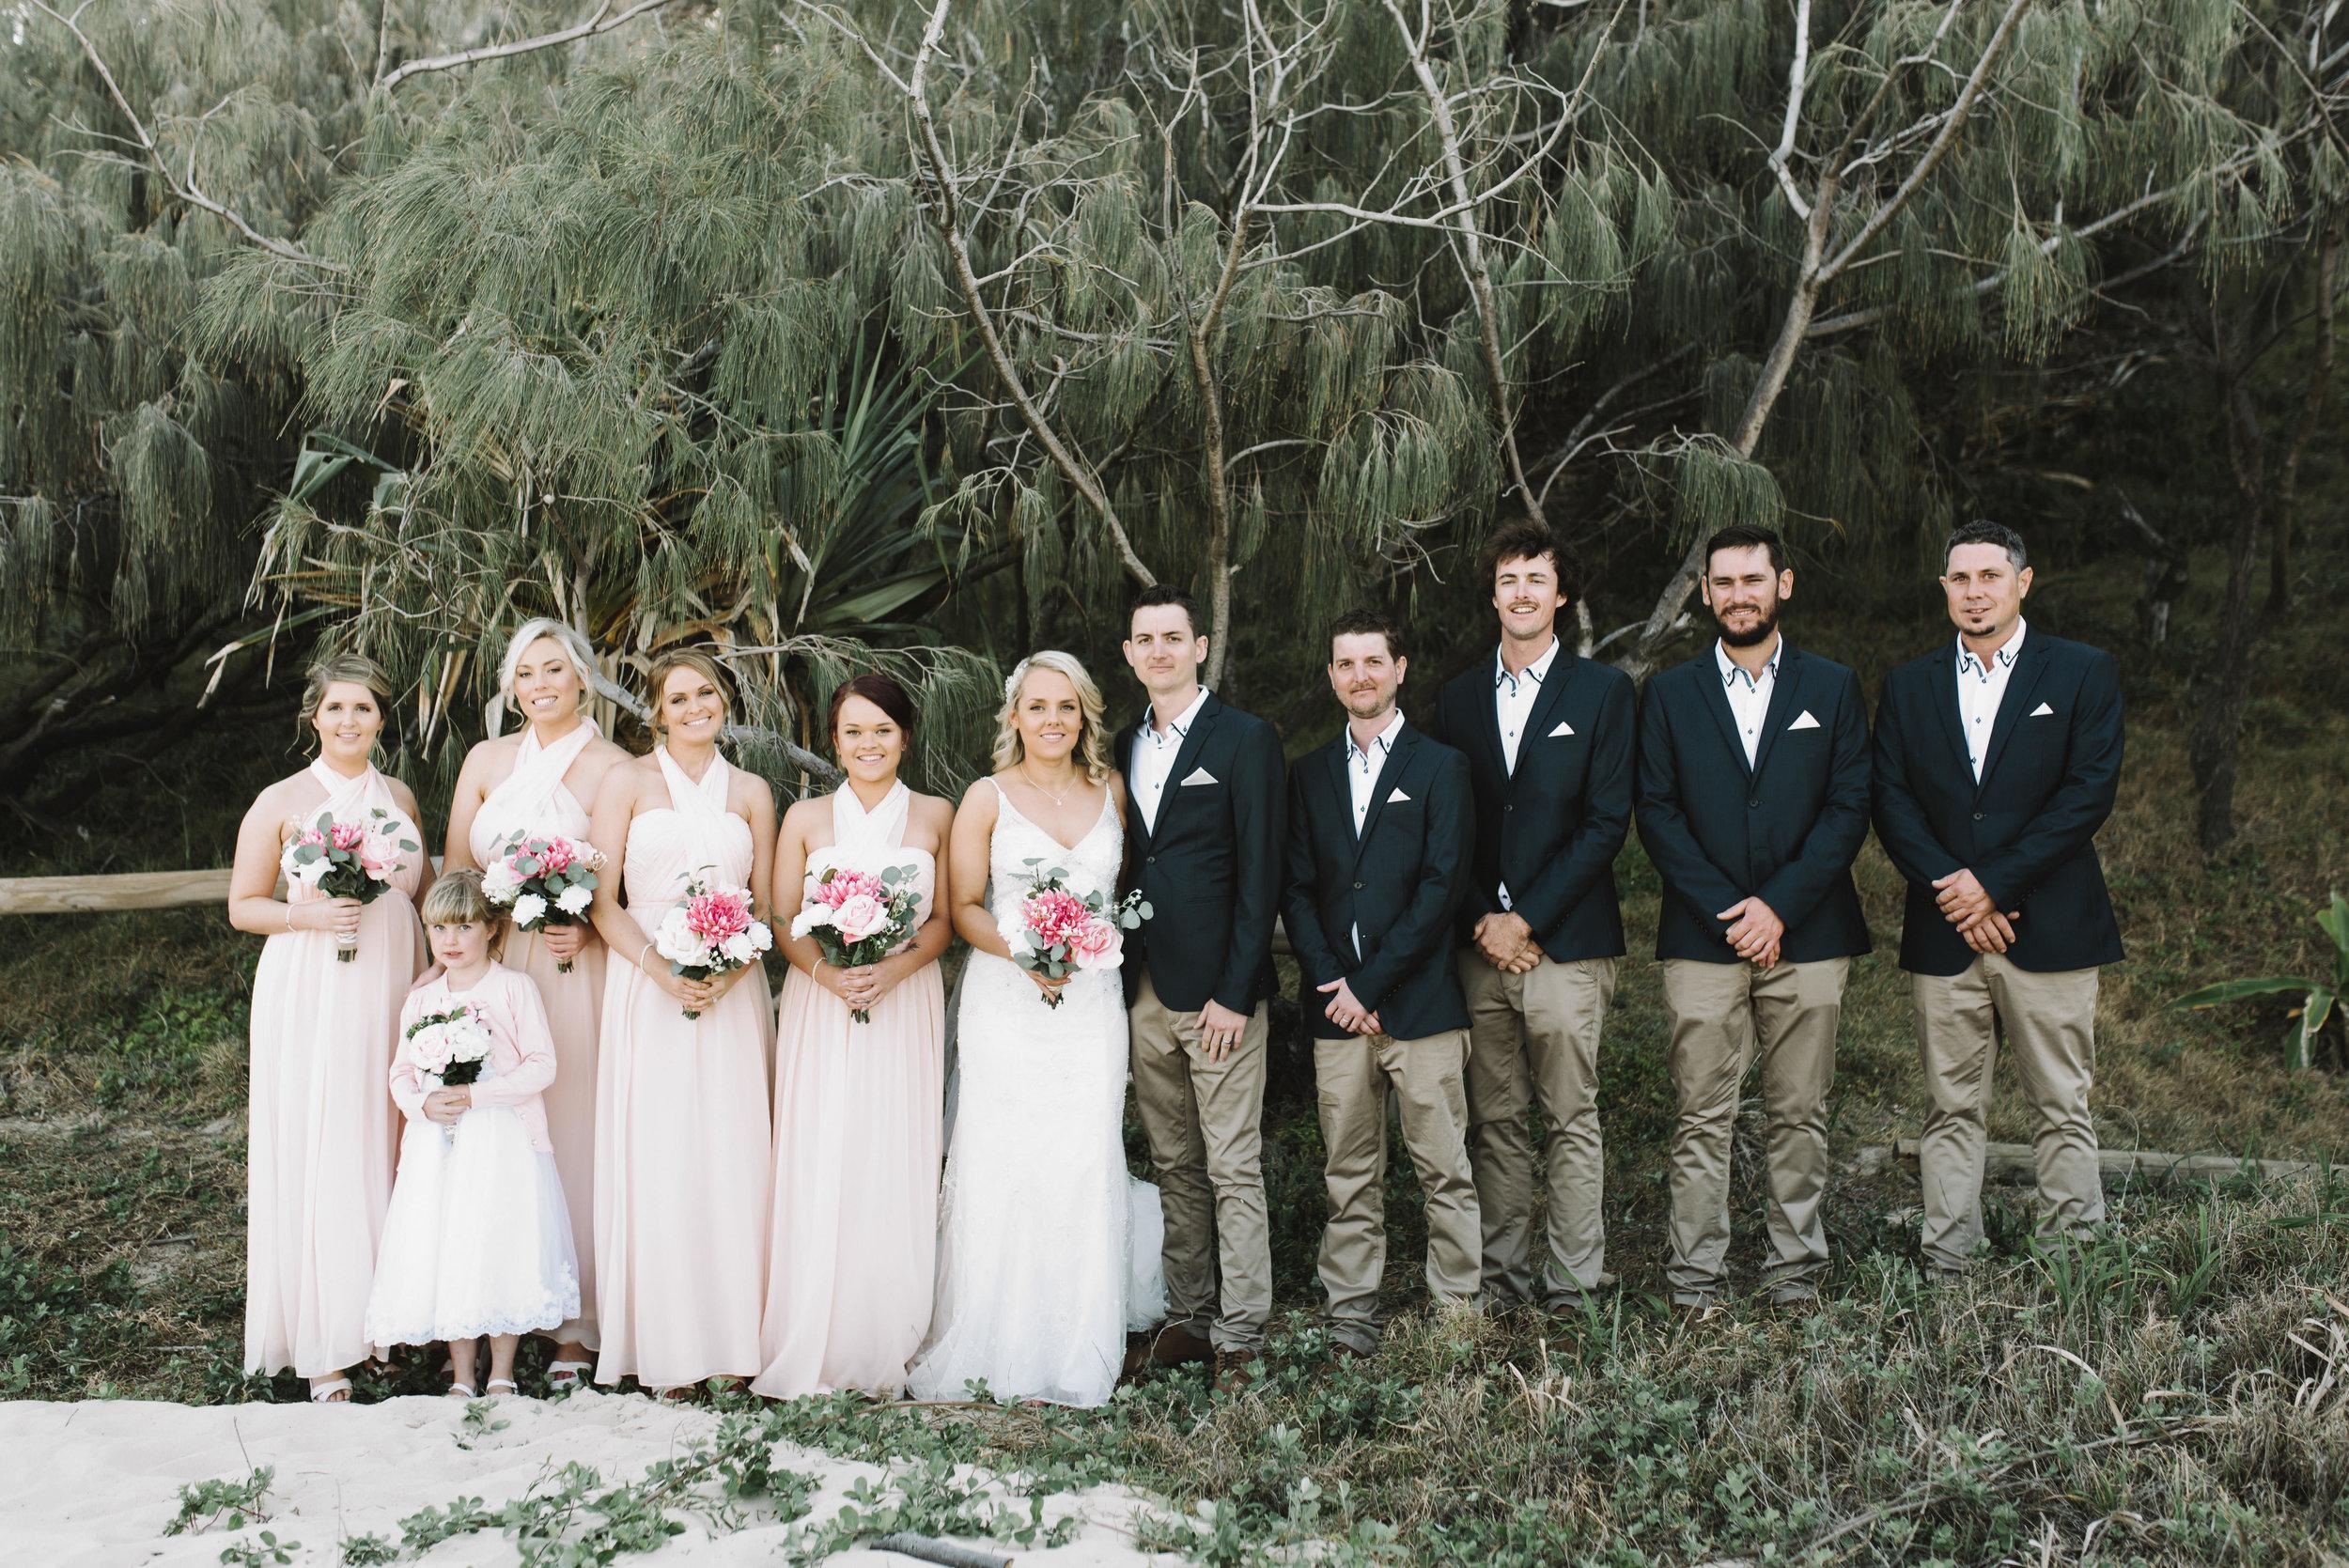 sunshine-coast-wedding-photography-48.jpg